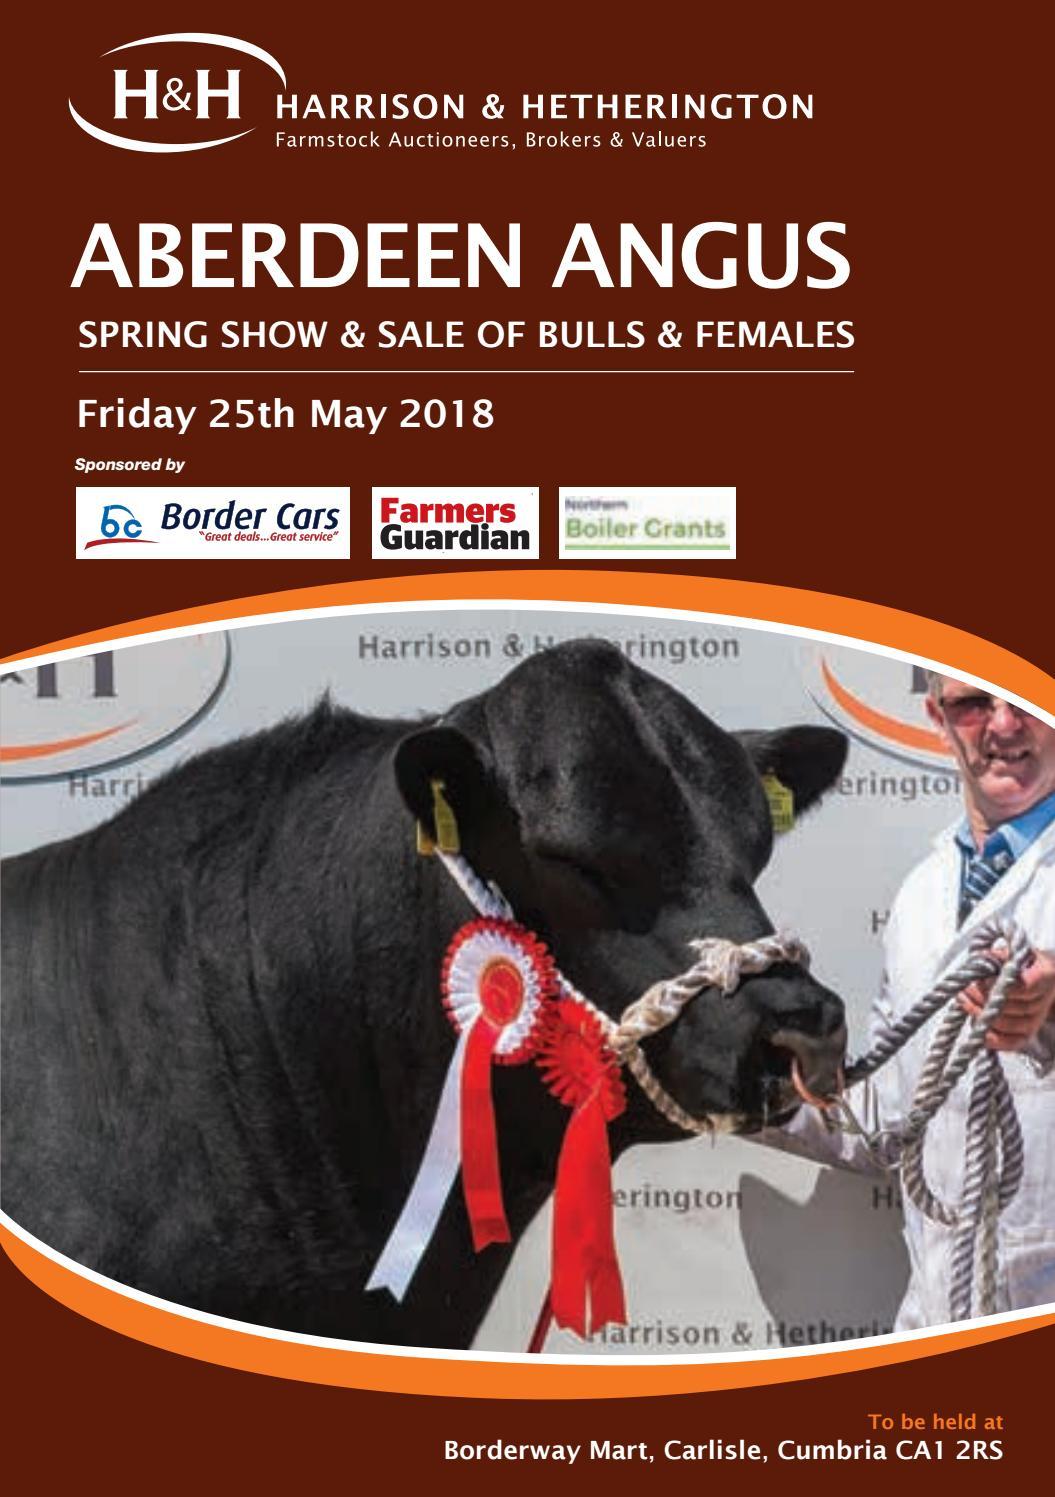 Aberdeen angus 250518 by Harrison & Hetherington - issuu